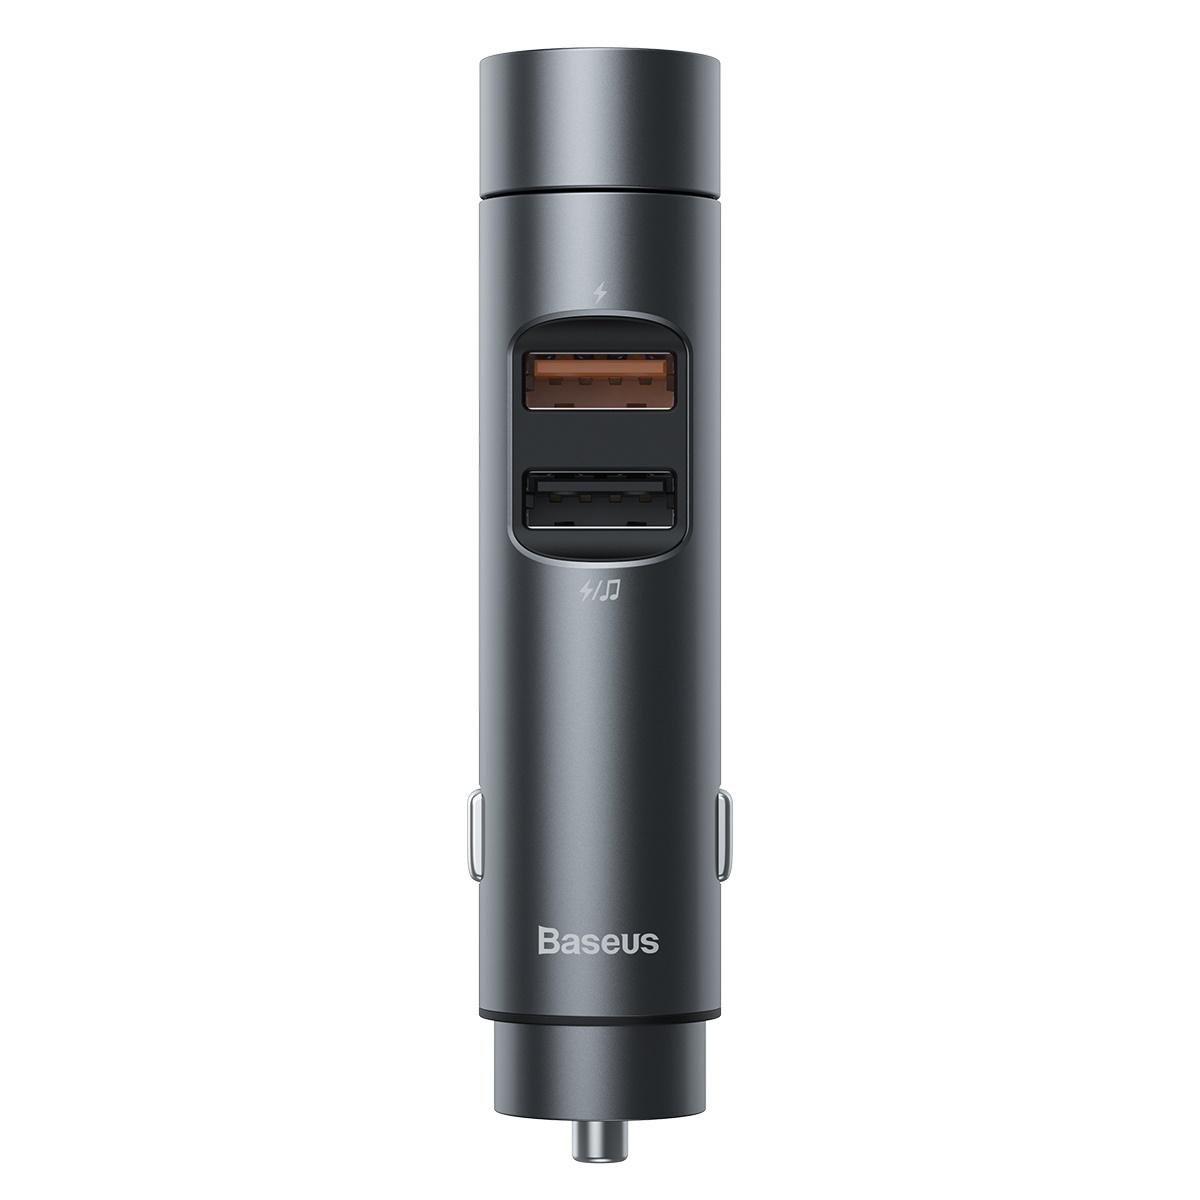 Baseus CCNLZ-C0G Energy Column FM-sändare, USB, 18W